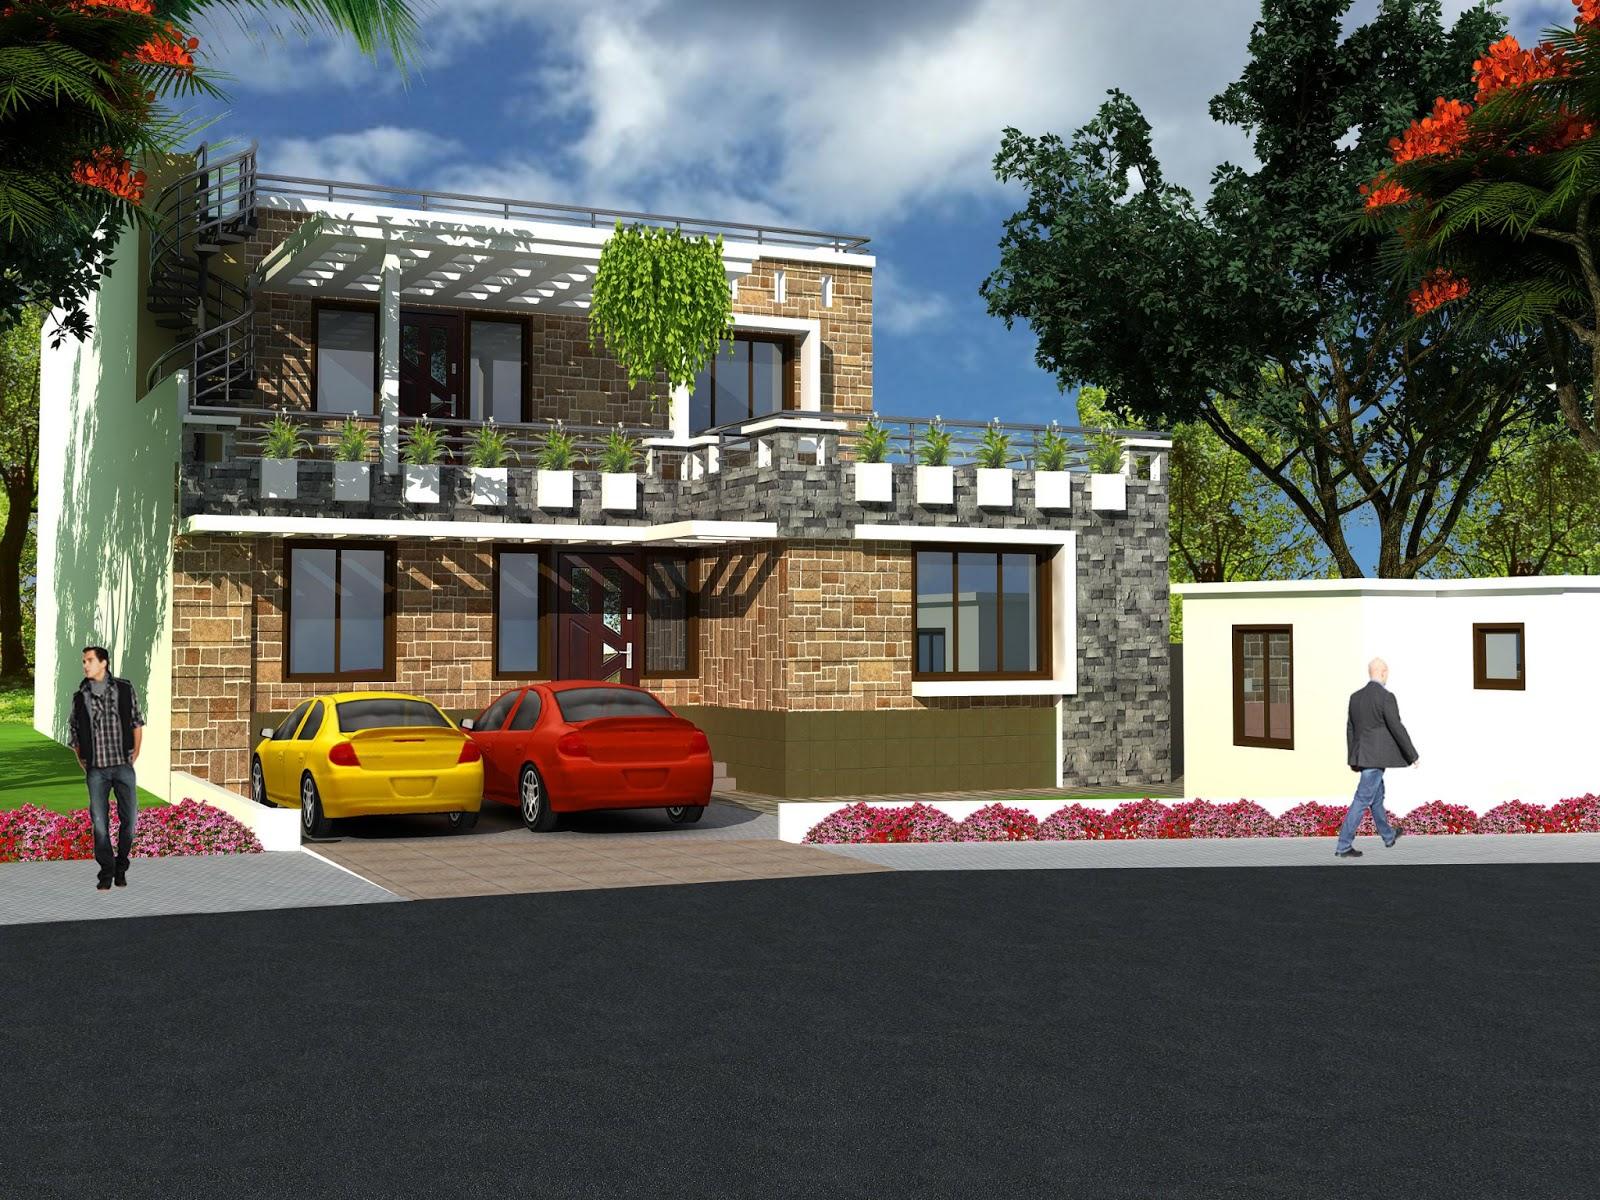 Apna ghar elevation joy studio design gallery best design for Ghar plans design